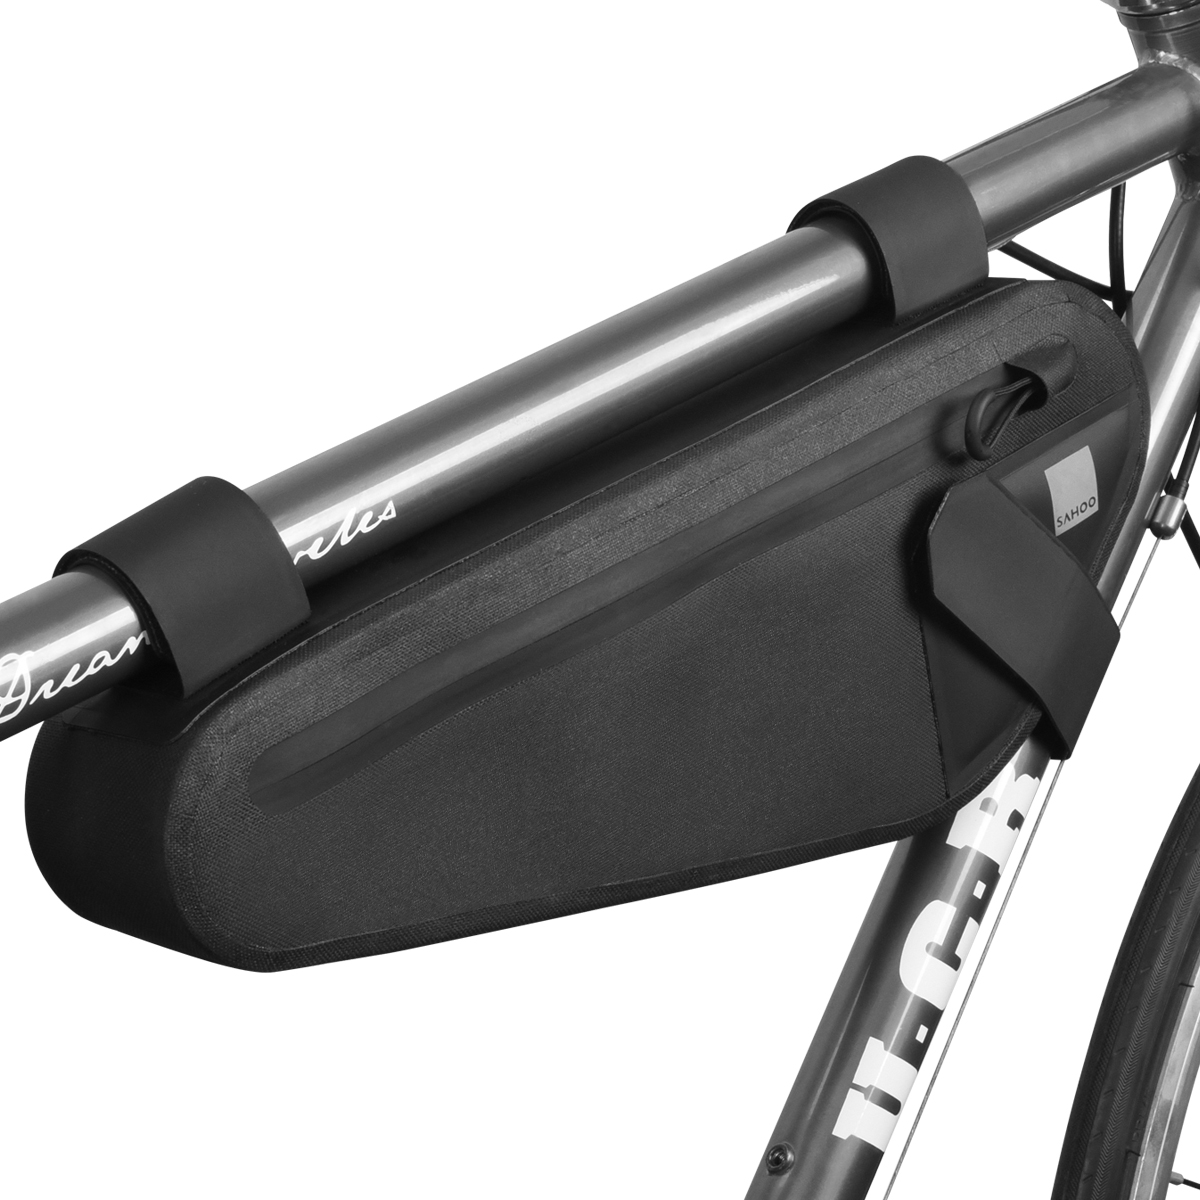 Cycling Bicycle Bike Handlebar Front Frame Tube Bag Pouch Case Basket Pannier #5